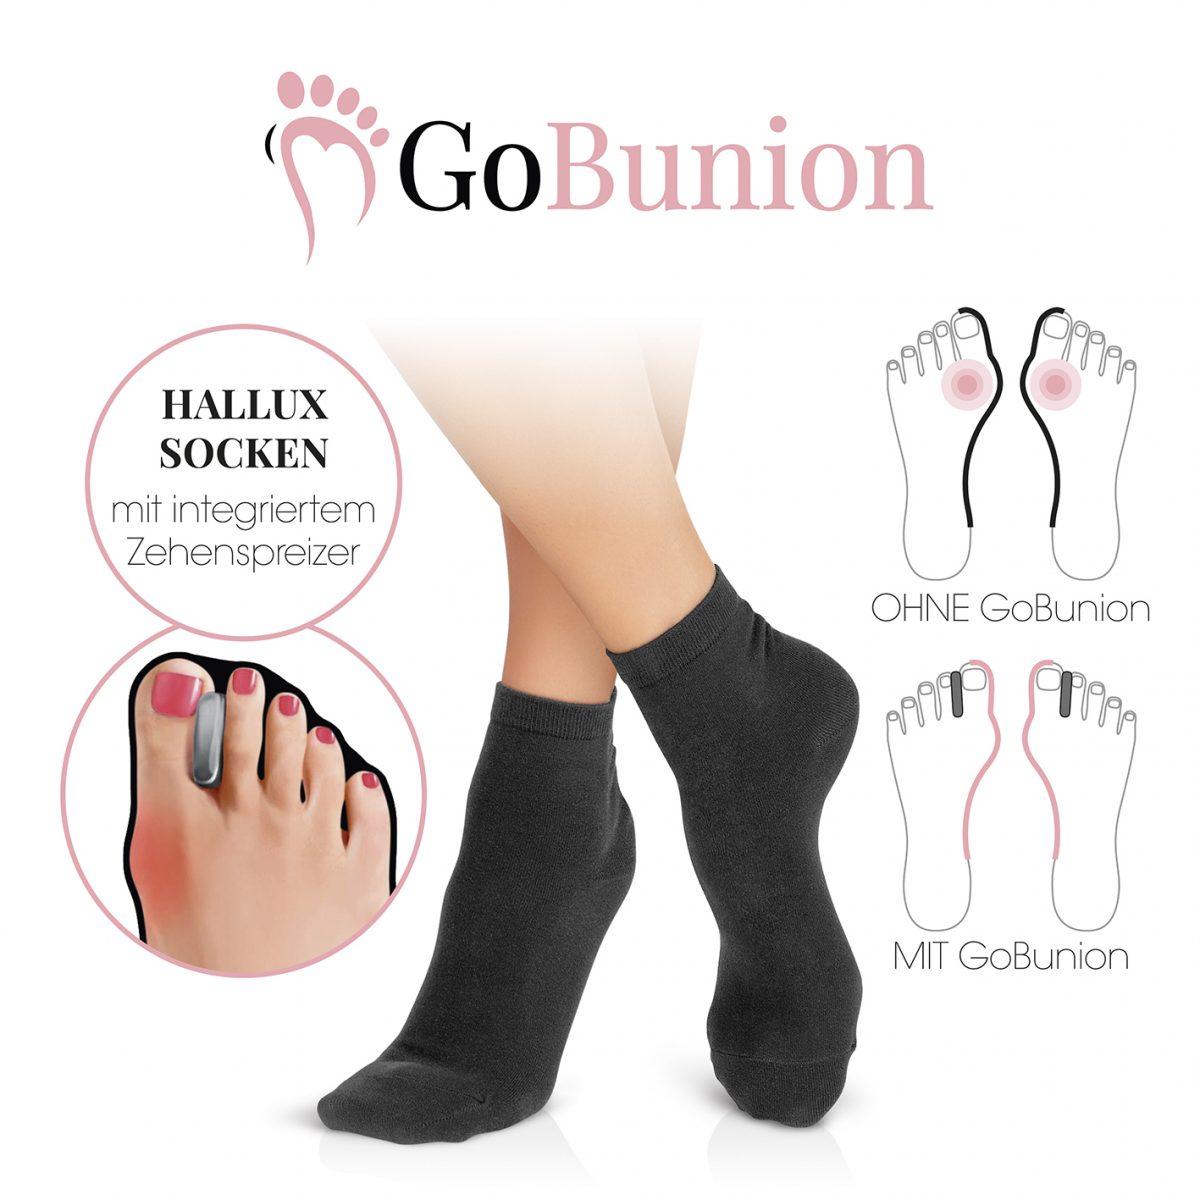 Gobunion Produkt